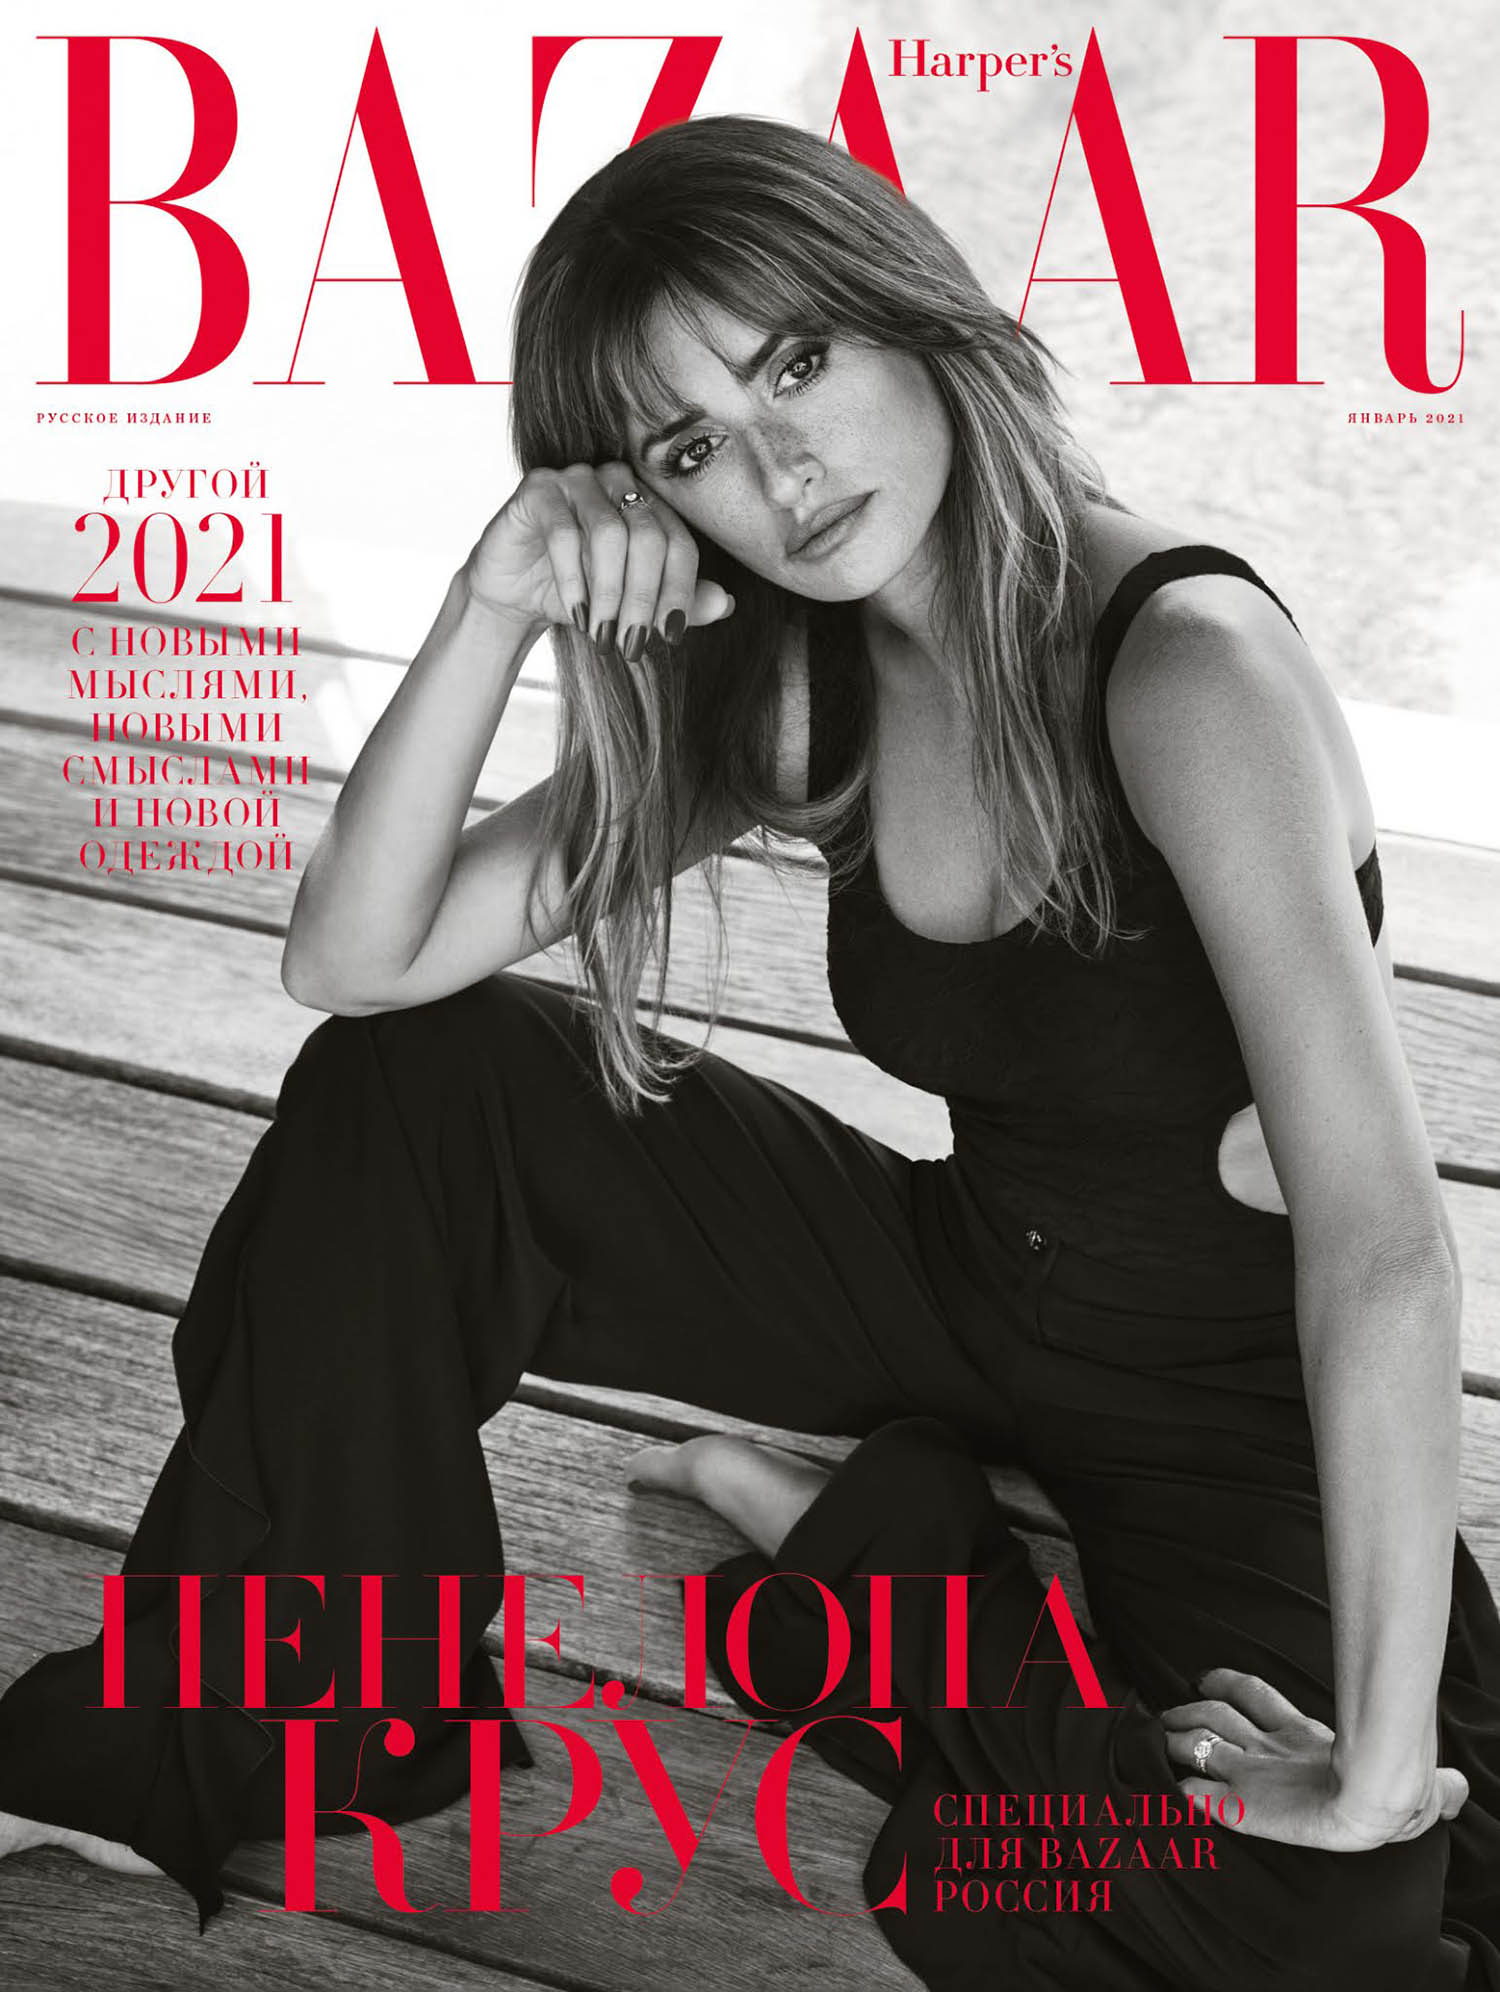 Penélope Cruz covers Harper's Bazaar Russia January 2021 by Nico Bustos